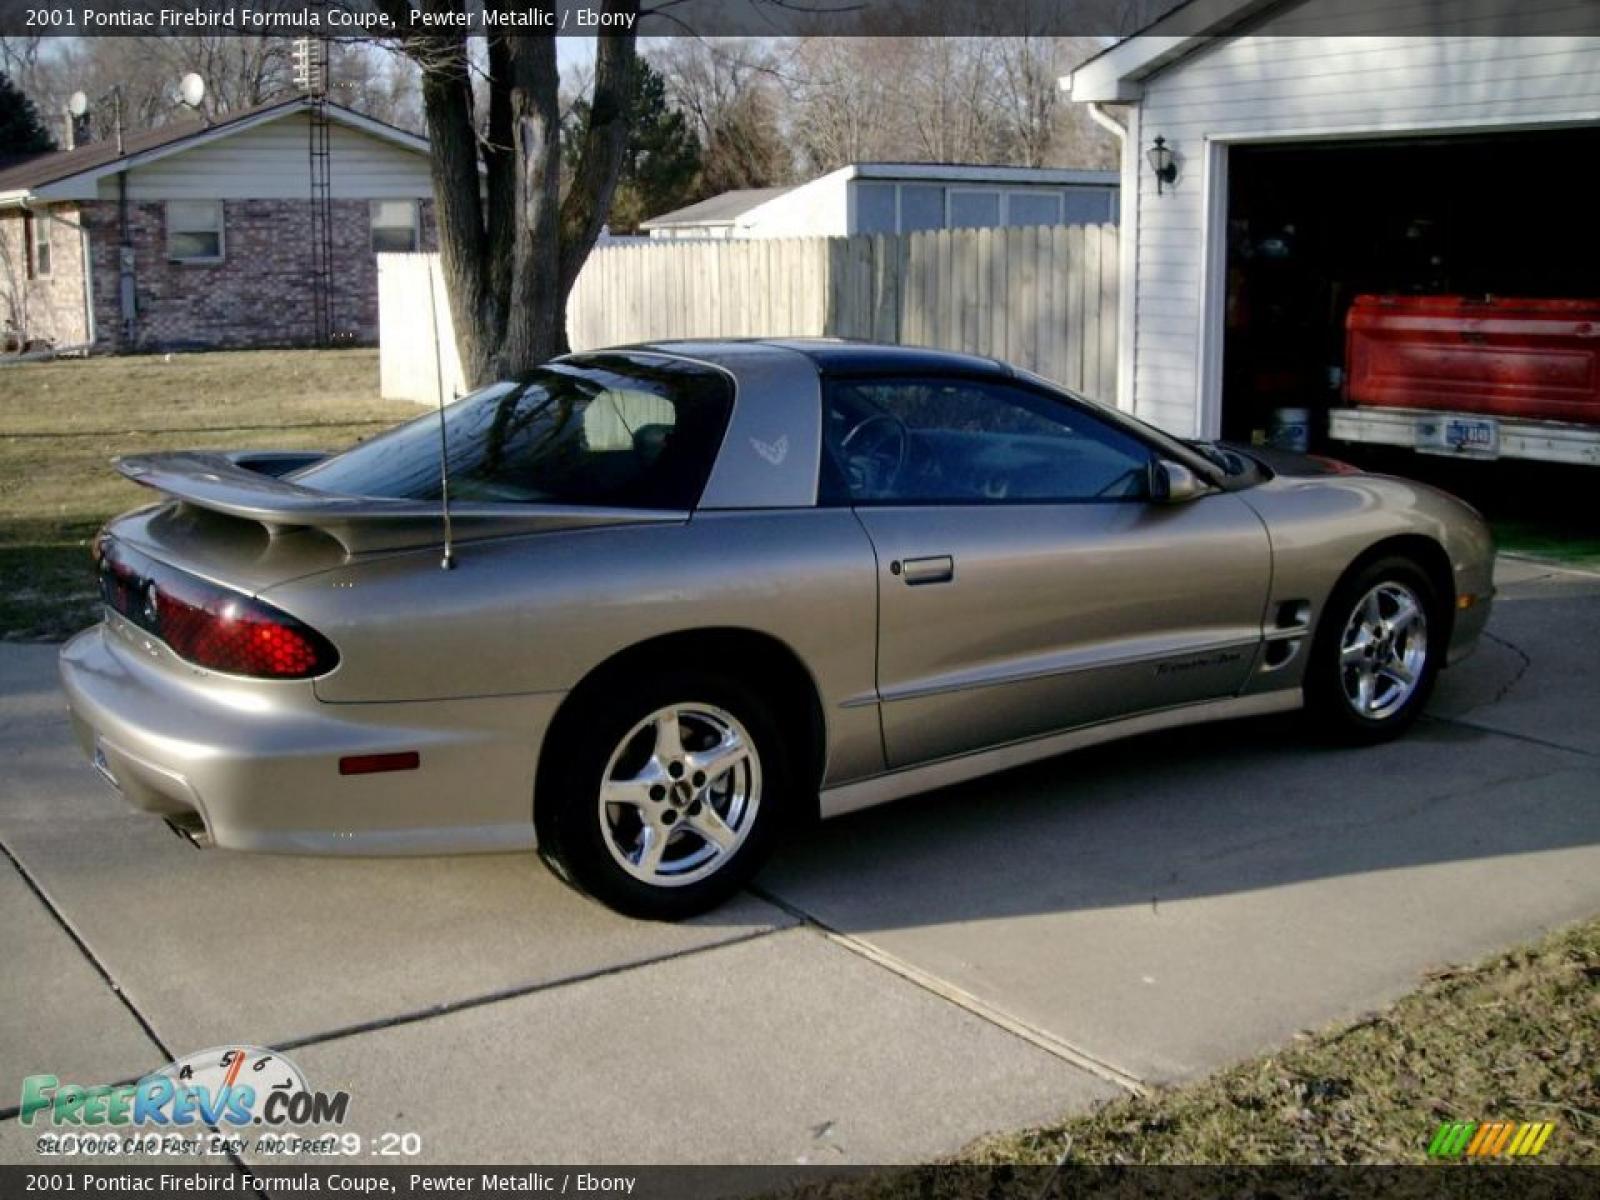 2001 Pontiac Firebird 11